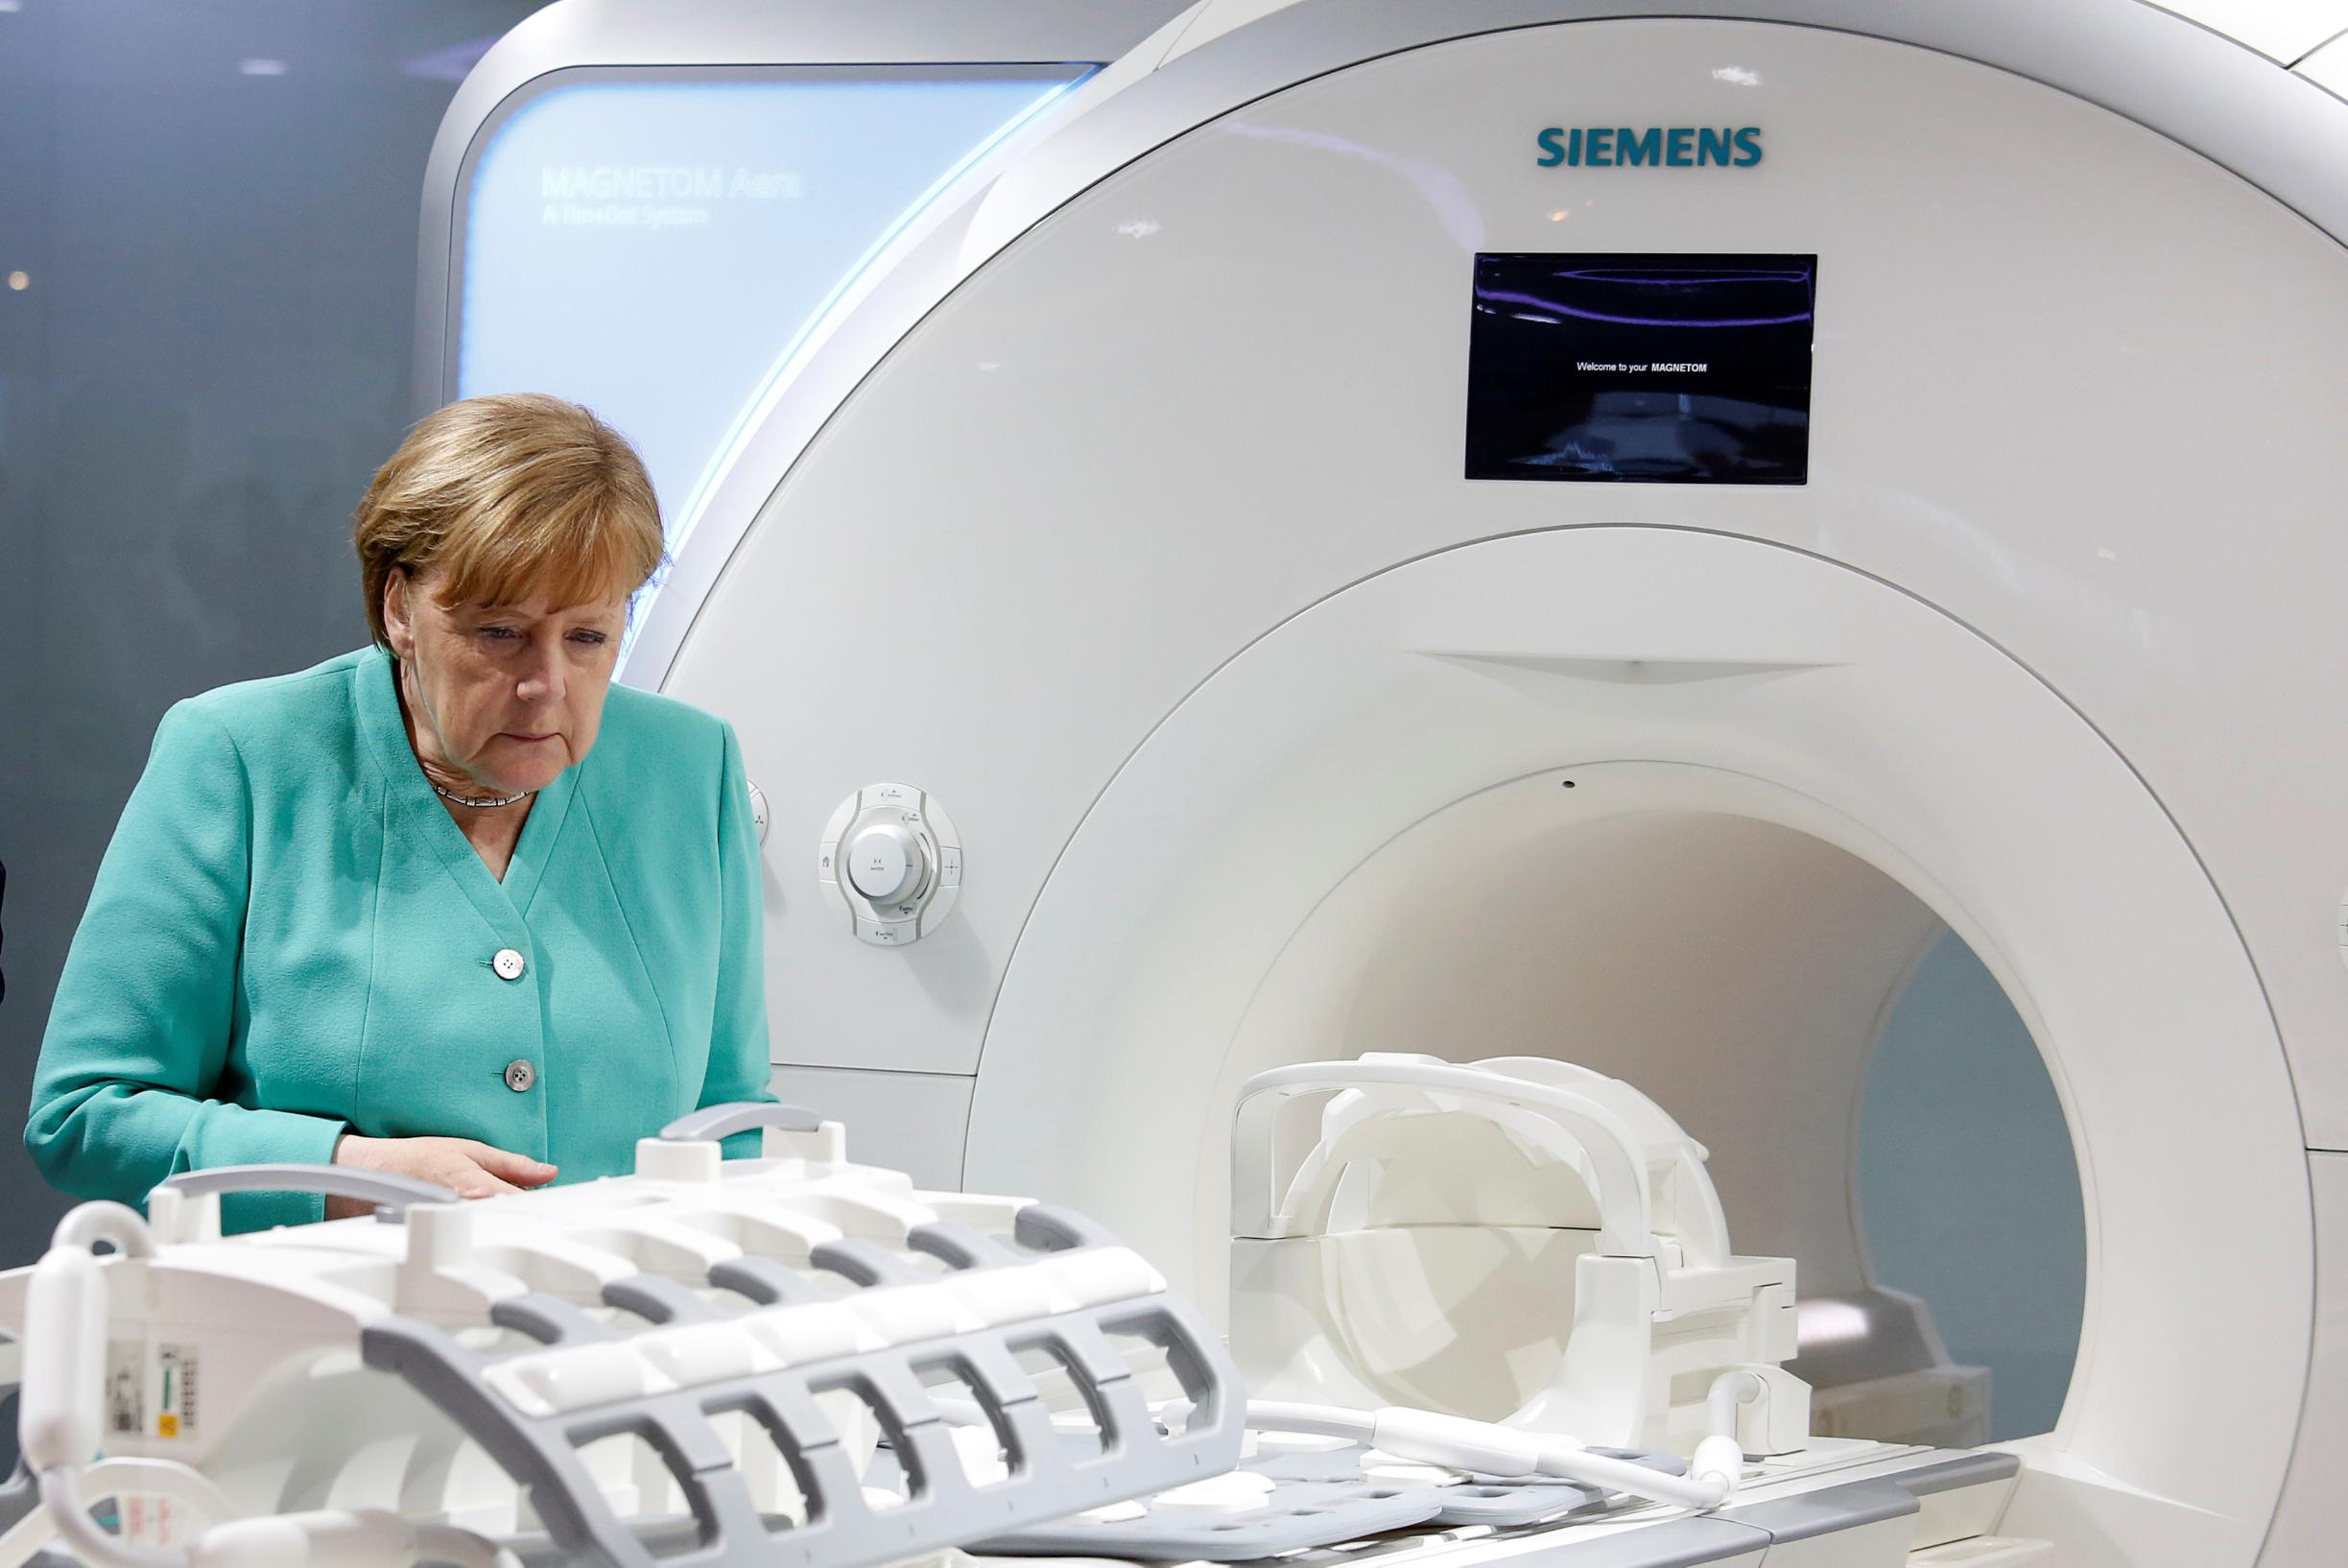 Angela Merkel u posjetu Siemens Healthineersu